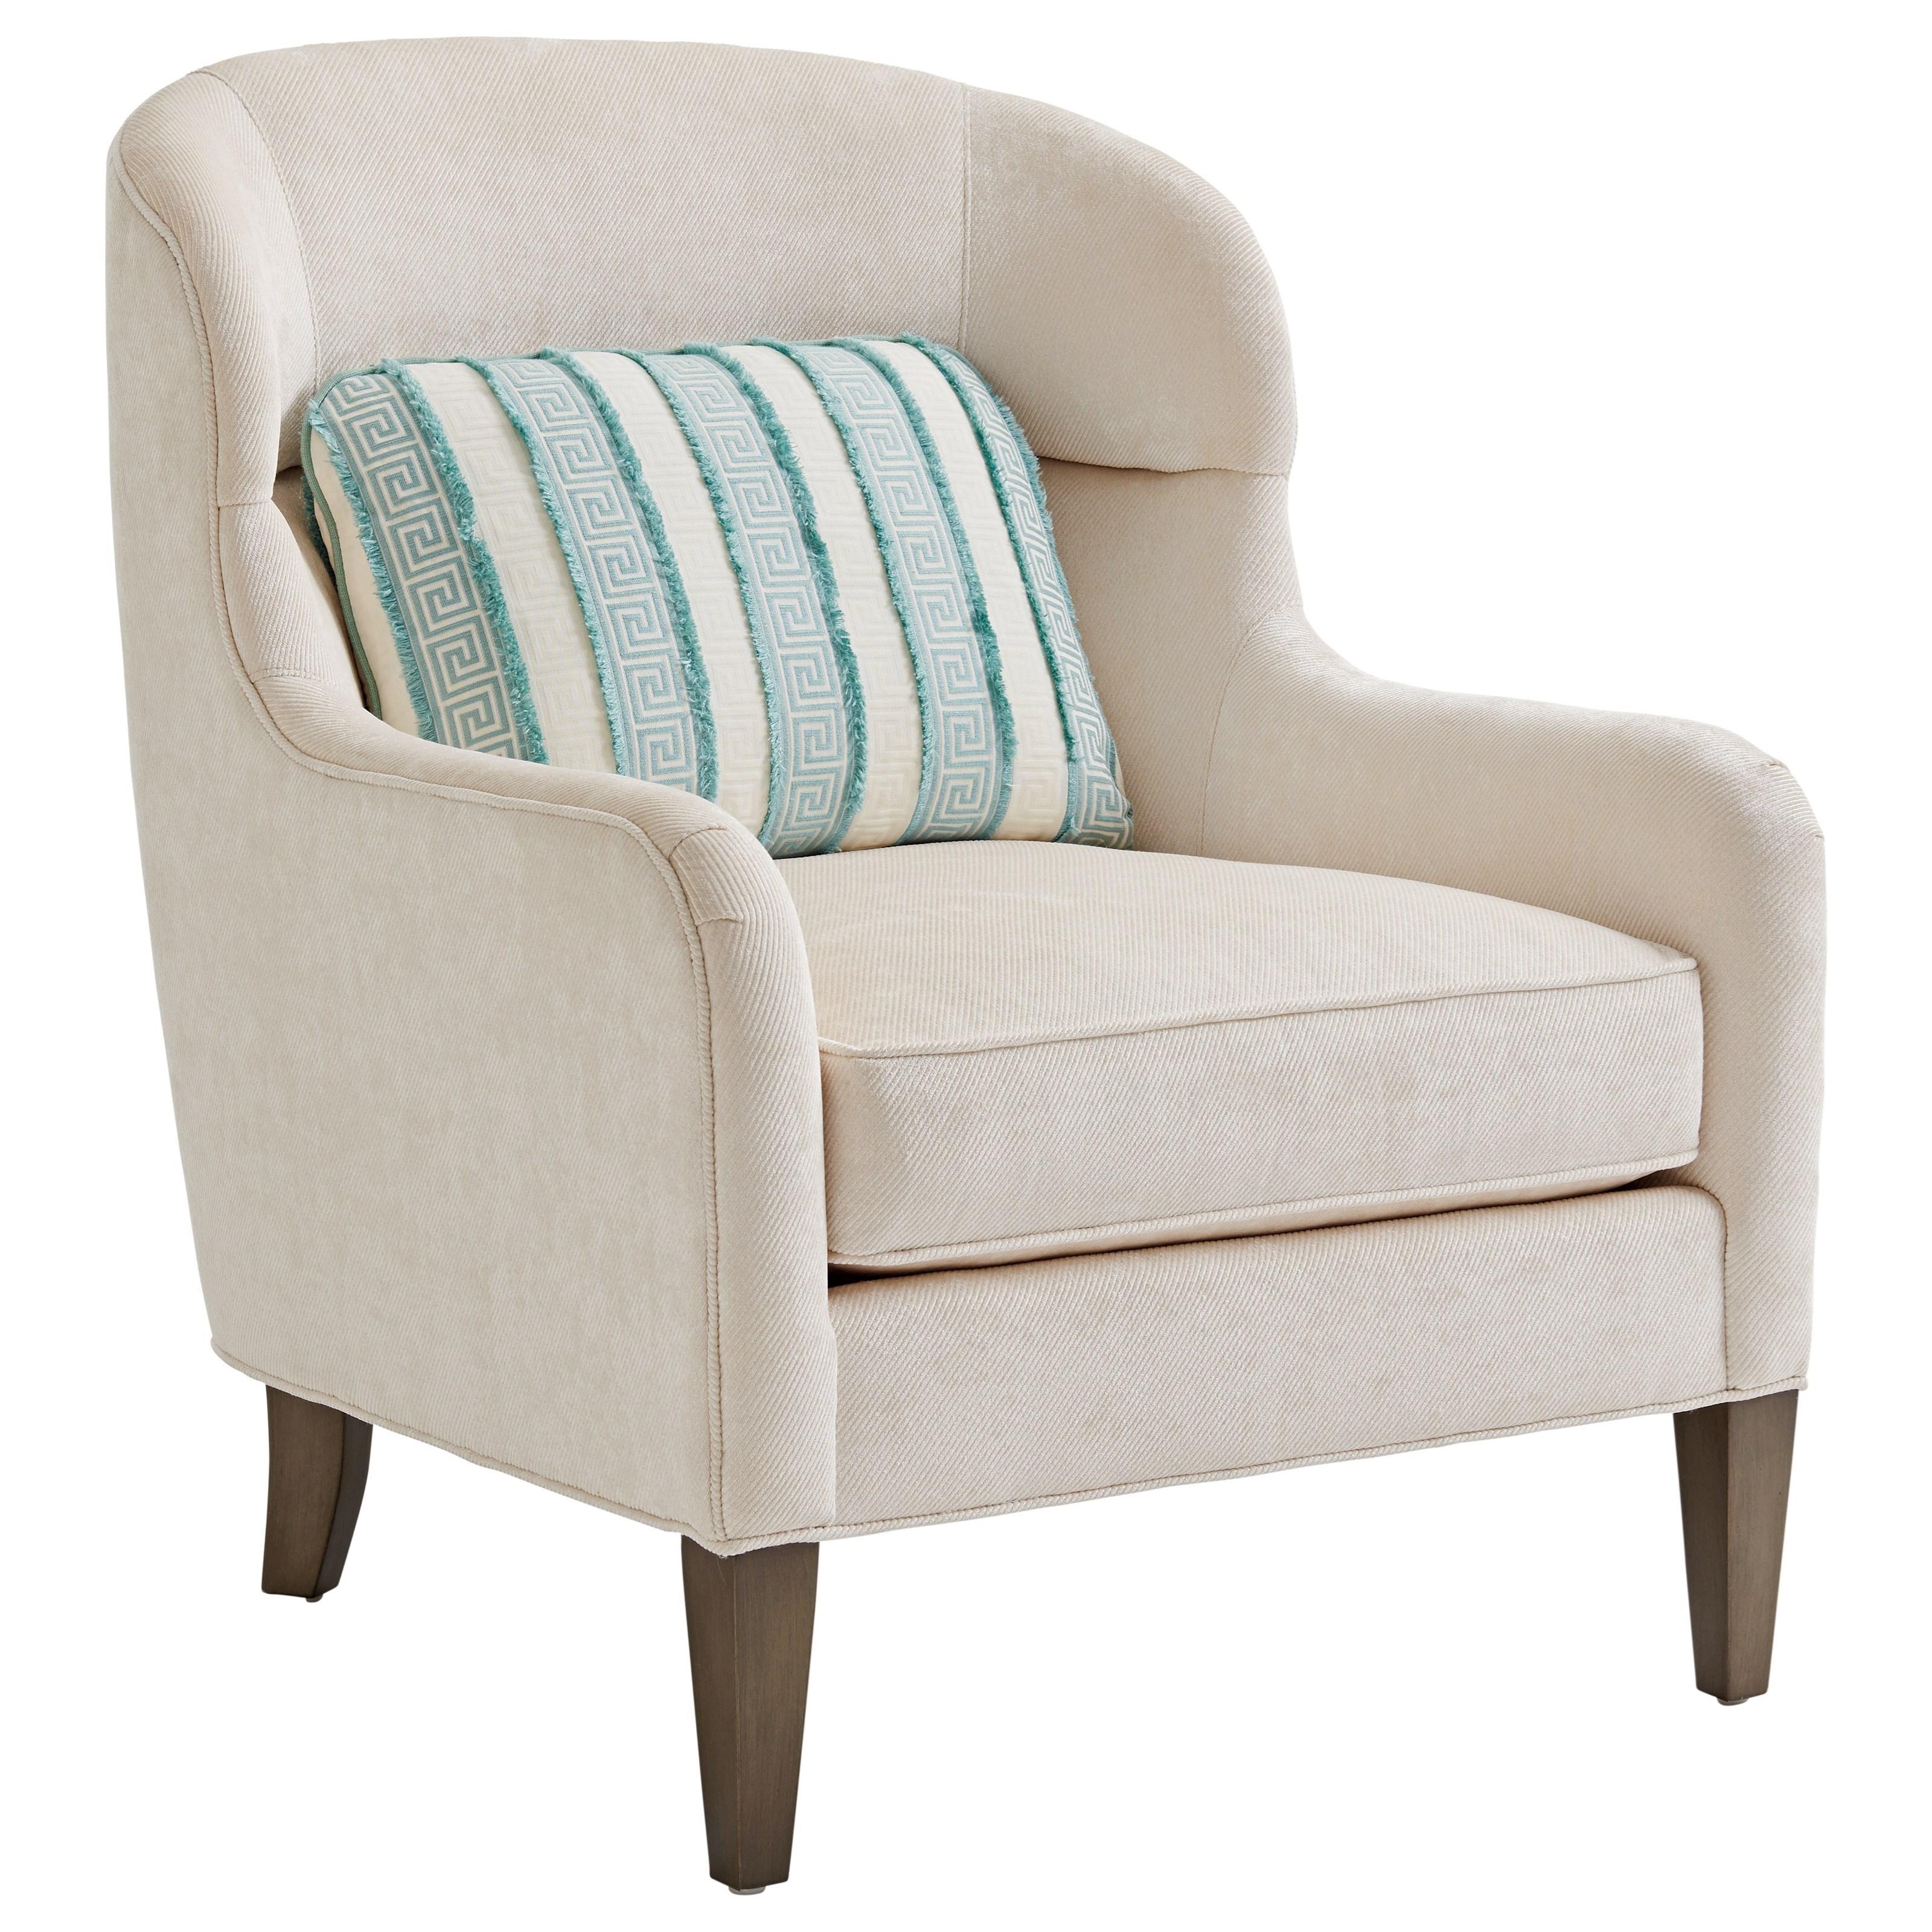 Chaffery Barrel Back Lounge Chair